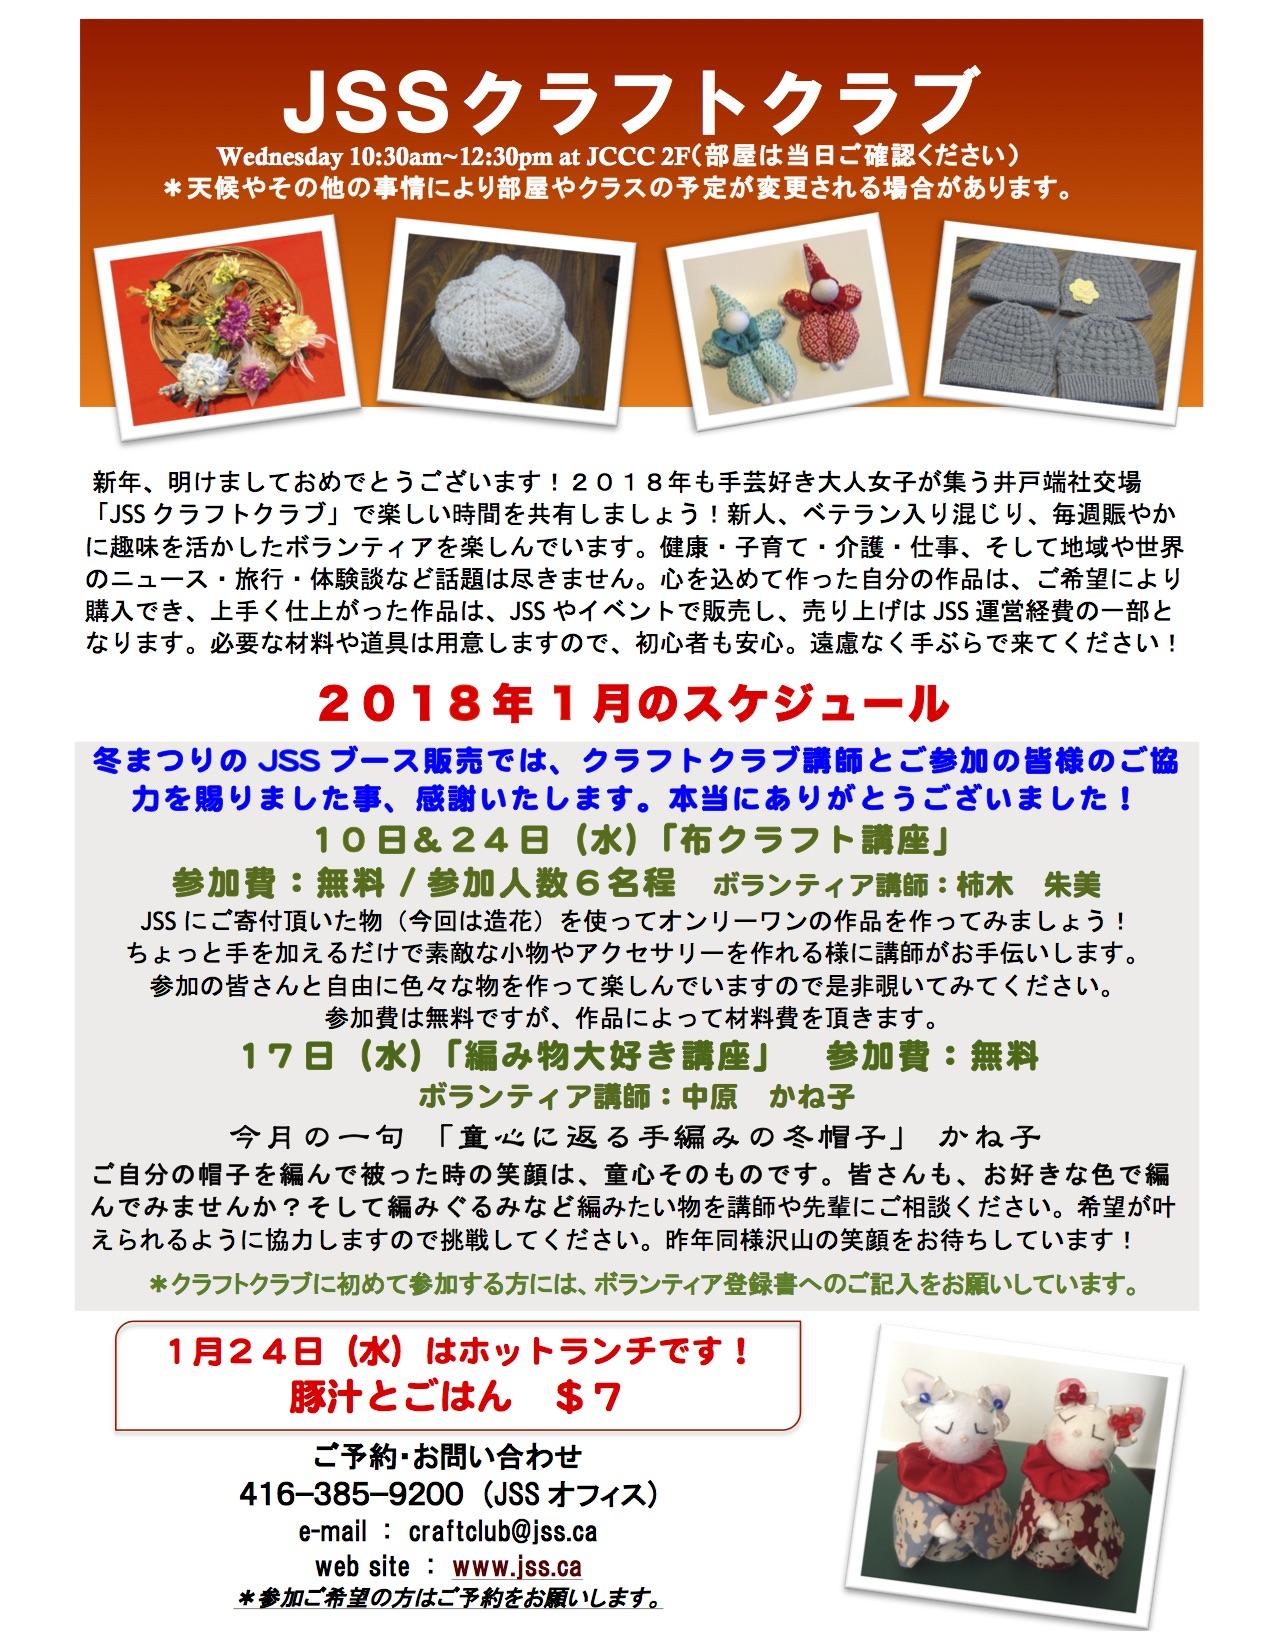 [:ja]JSS クラフトクラブ 1月の予定[:en]JSS Craft Club Schedule - January[:]